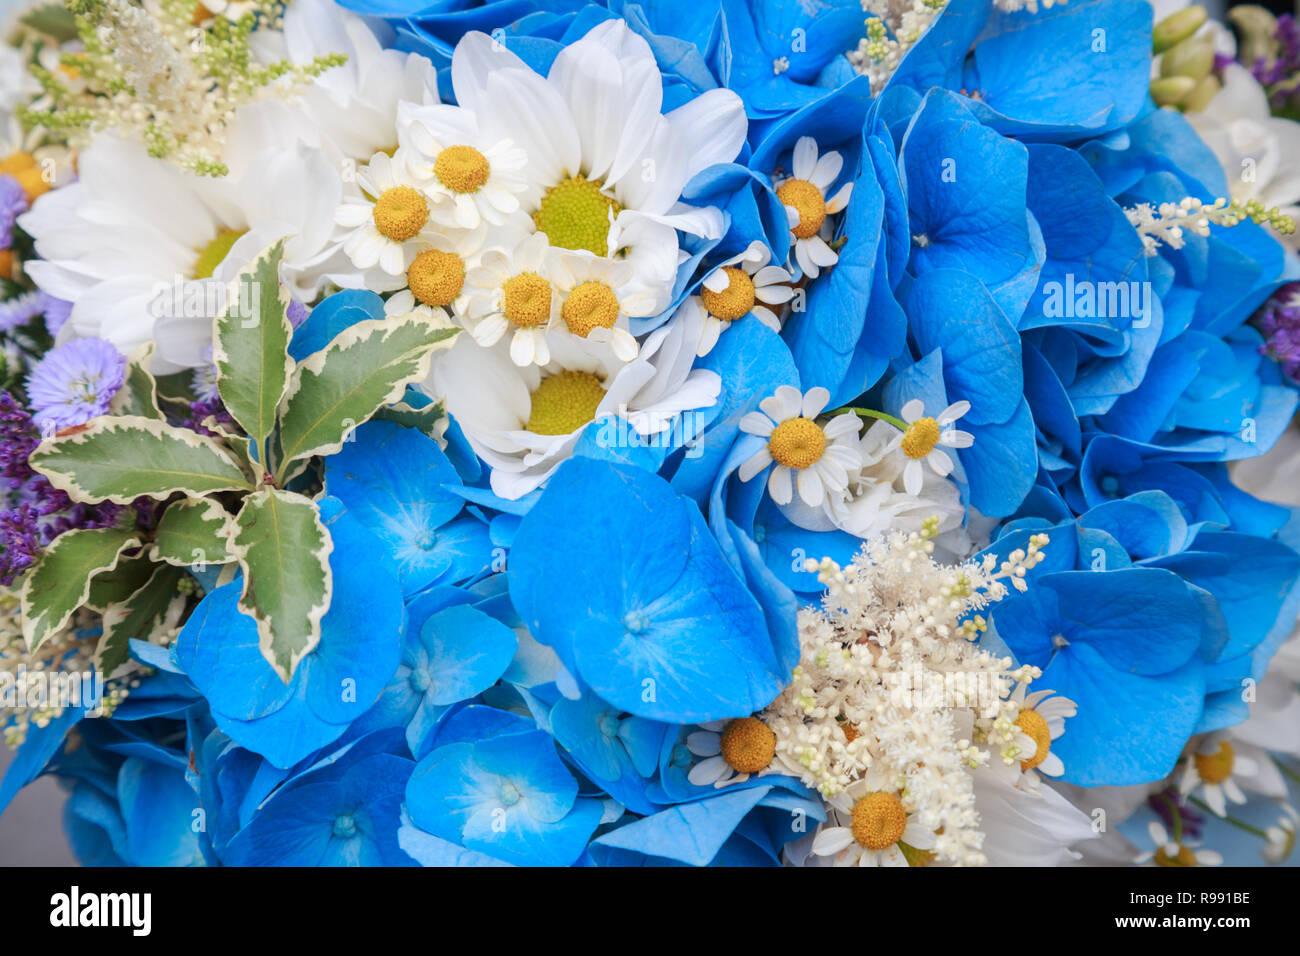 Wedding Bouquet Of Wild Flowers Closeup Rustic Style Stock Photo Alamy